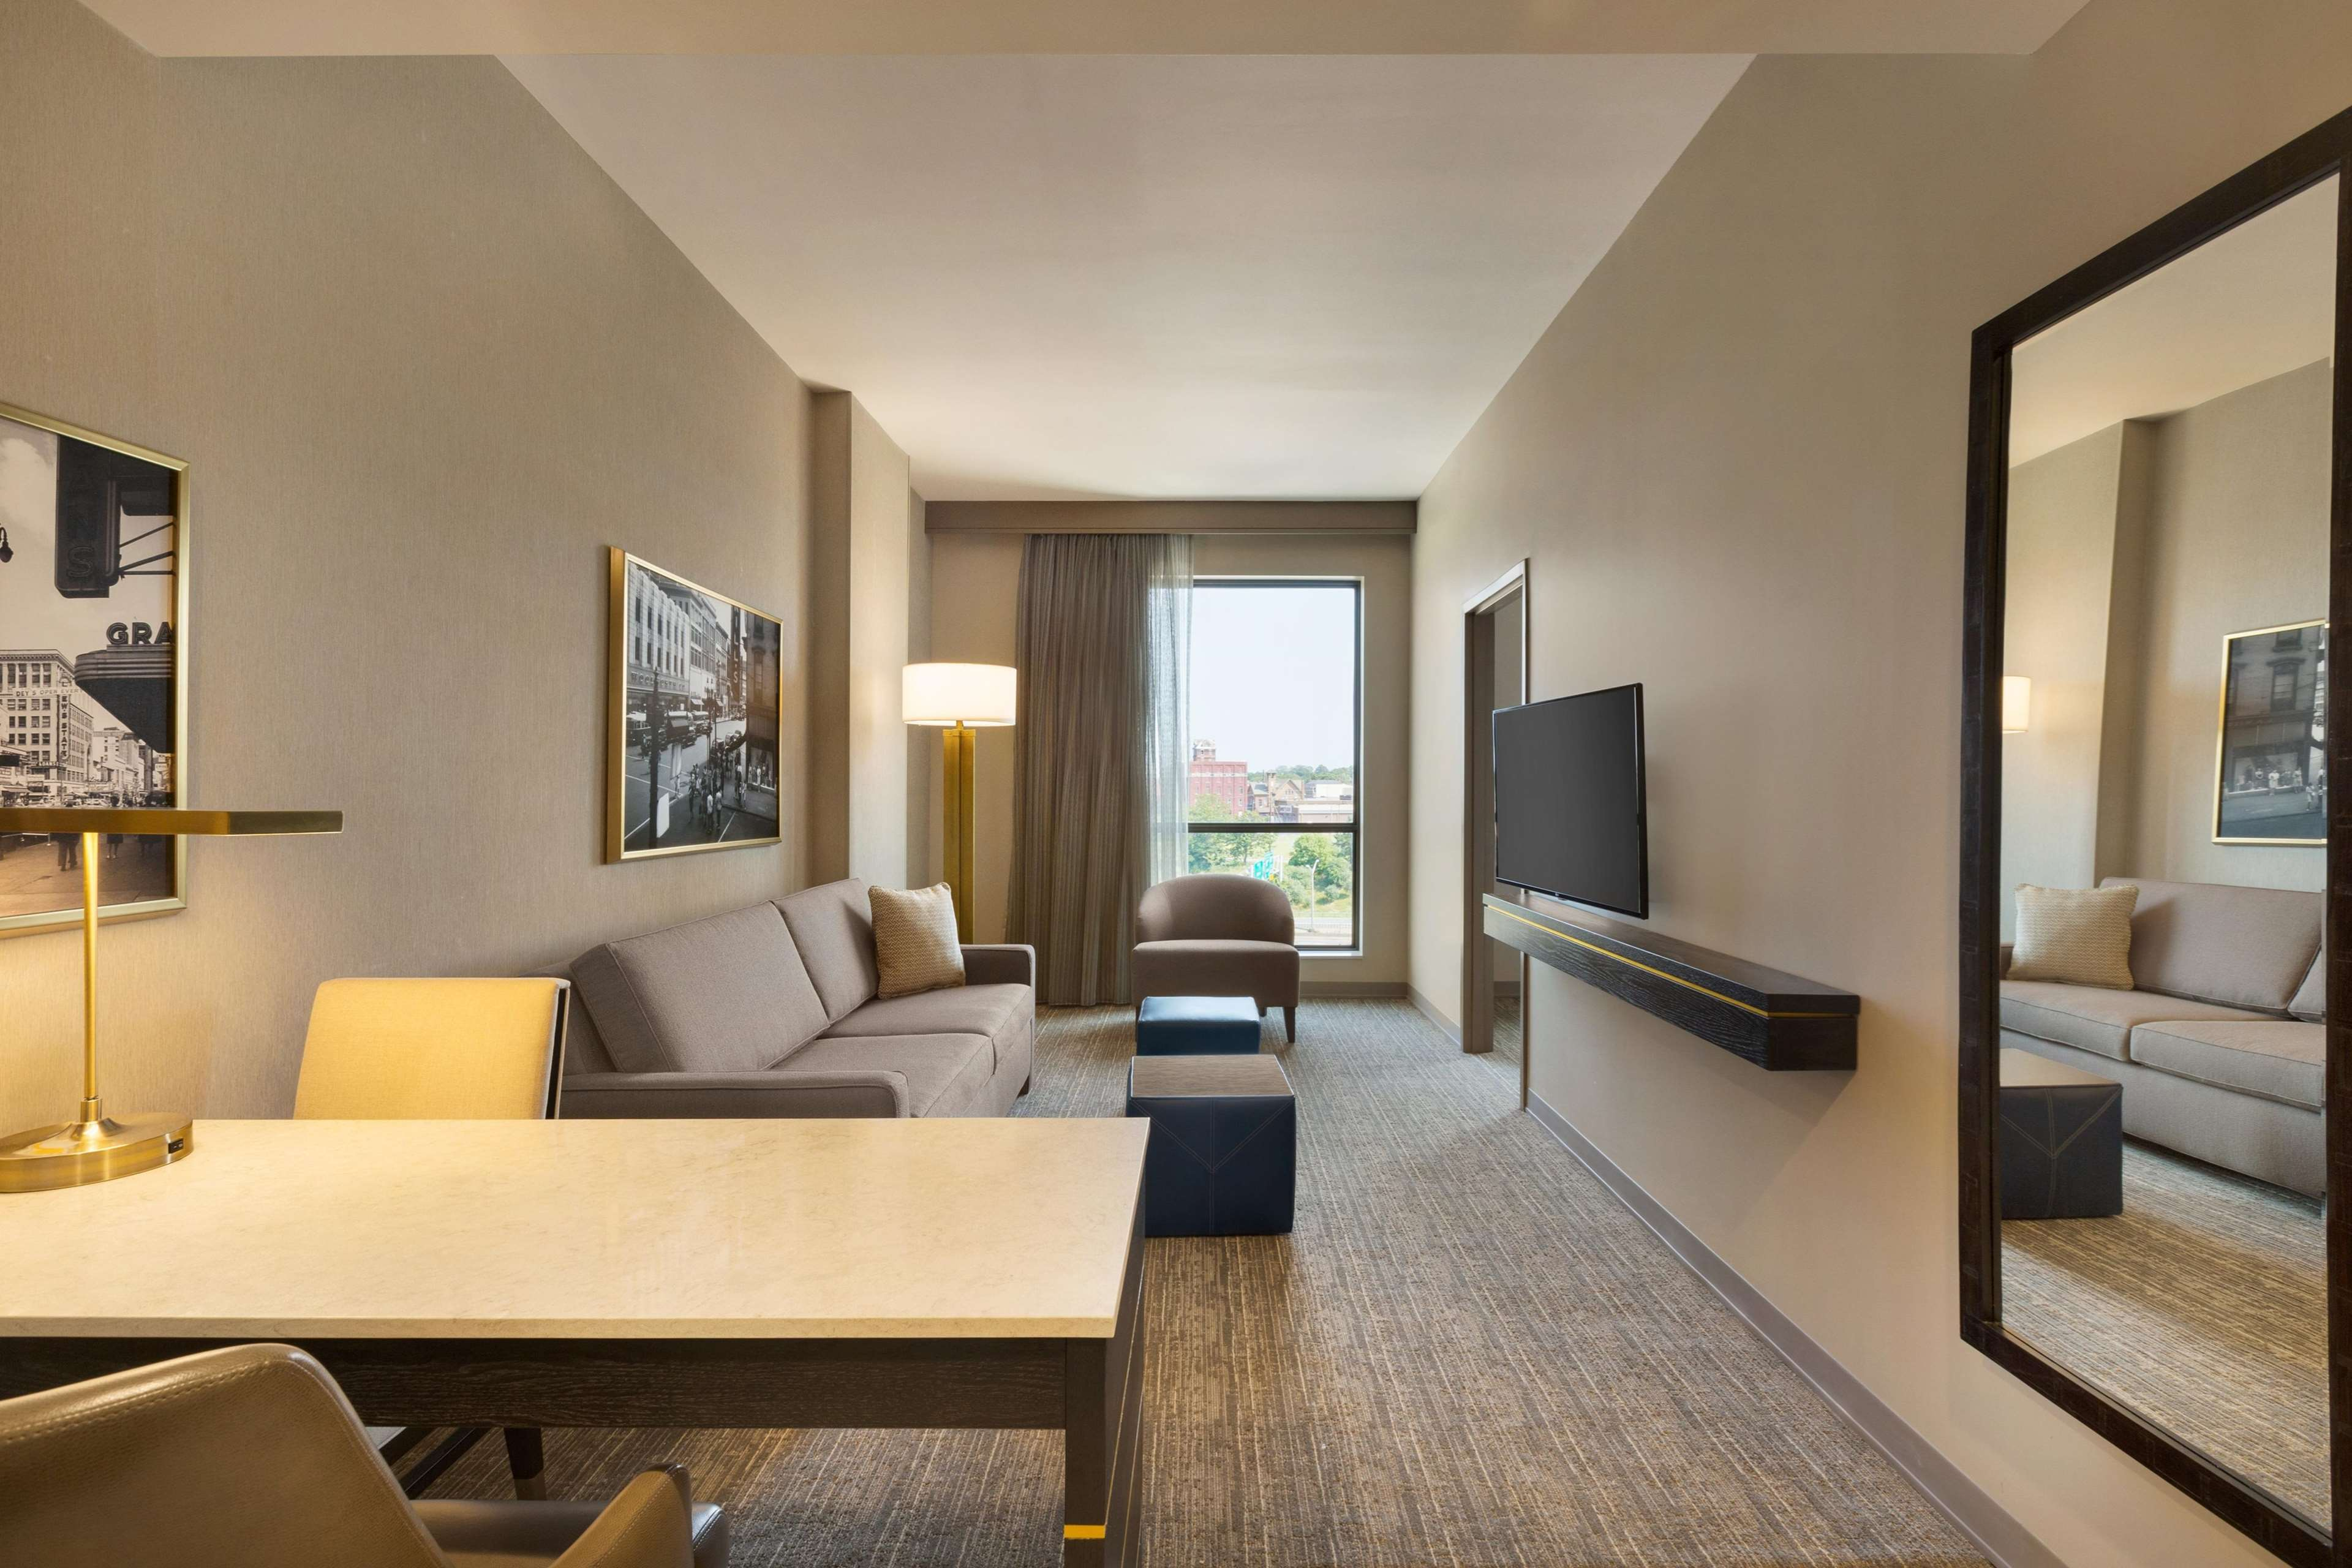 Embassy Suites by Hilton Syracuse Destiny USA image 2